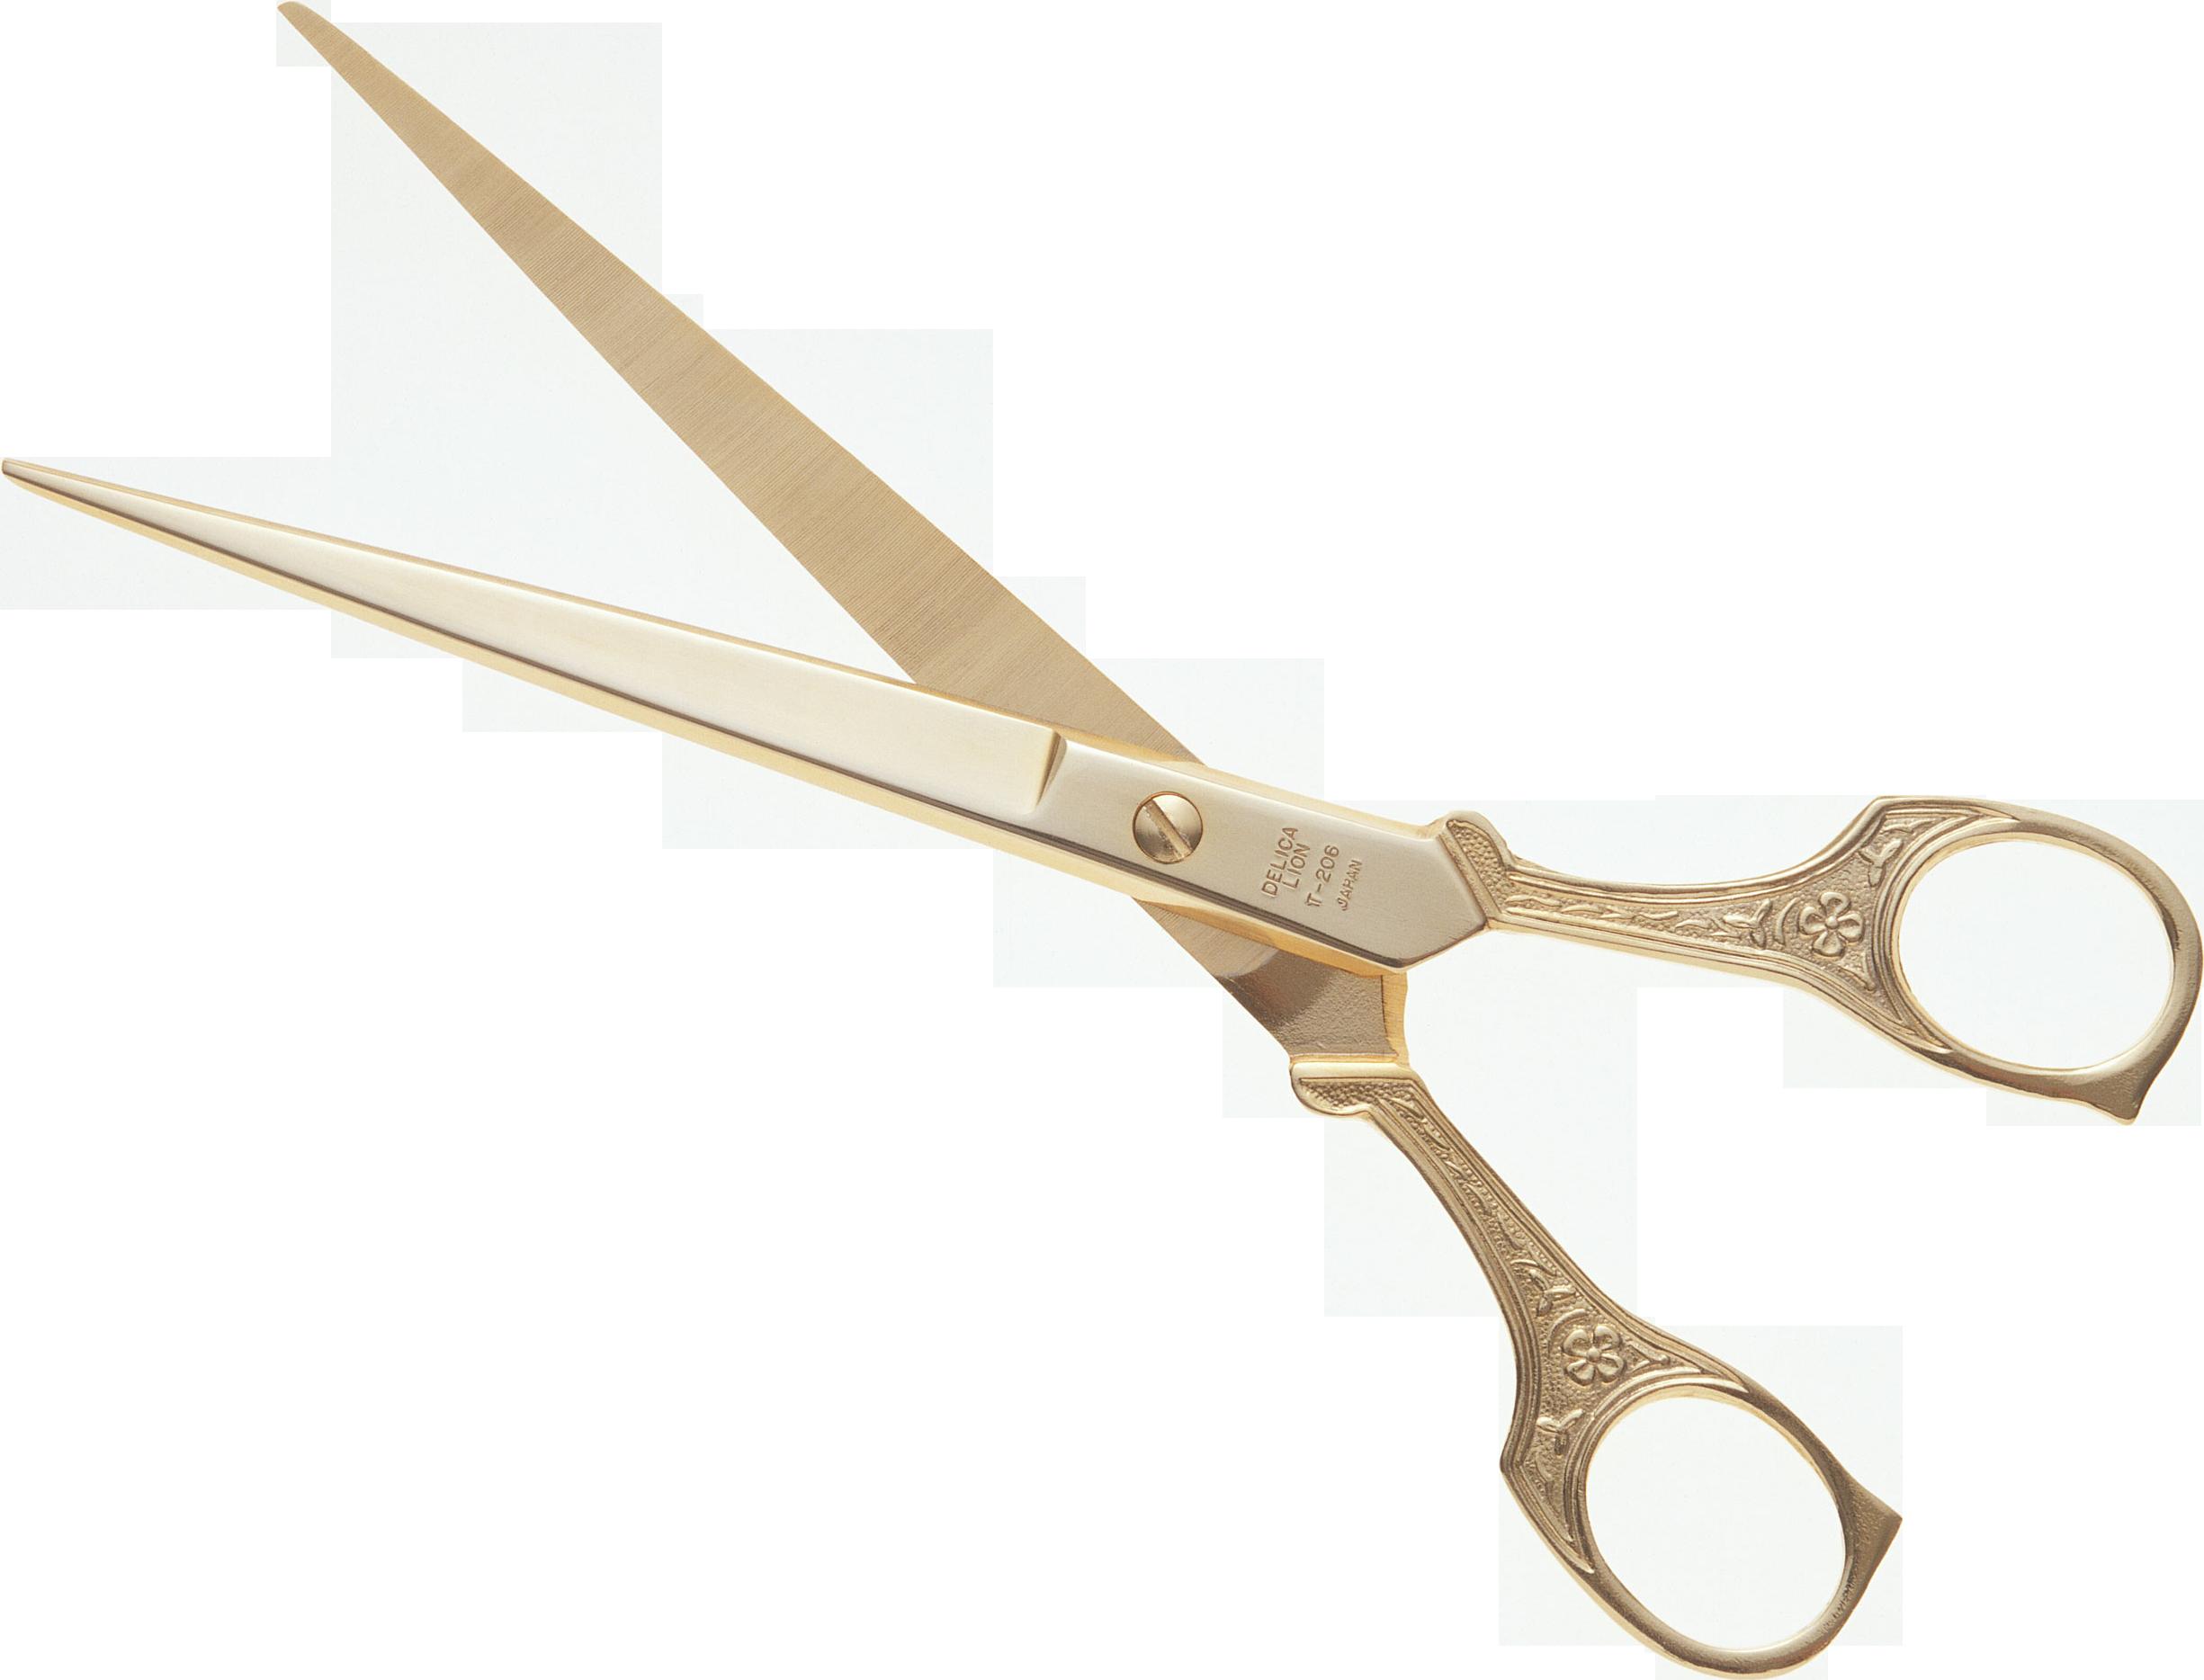 barber scissors png - photo #22